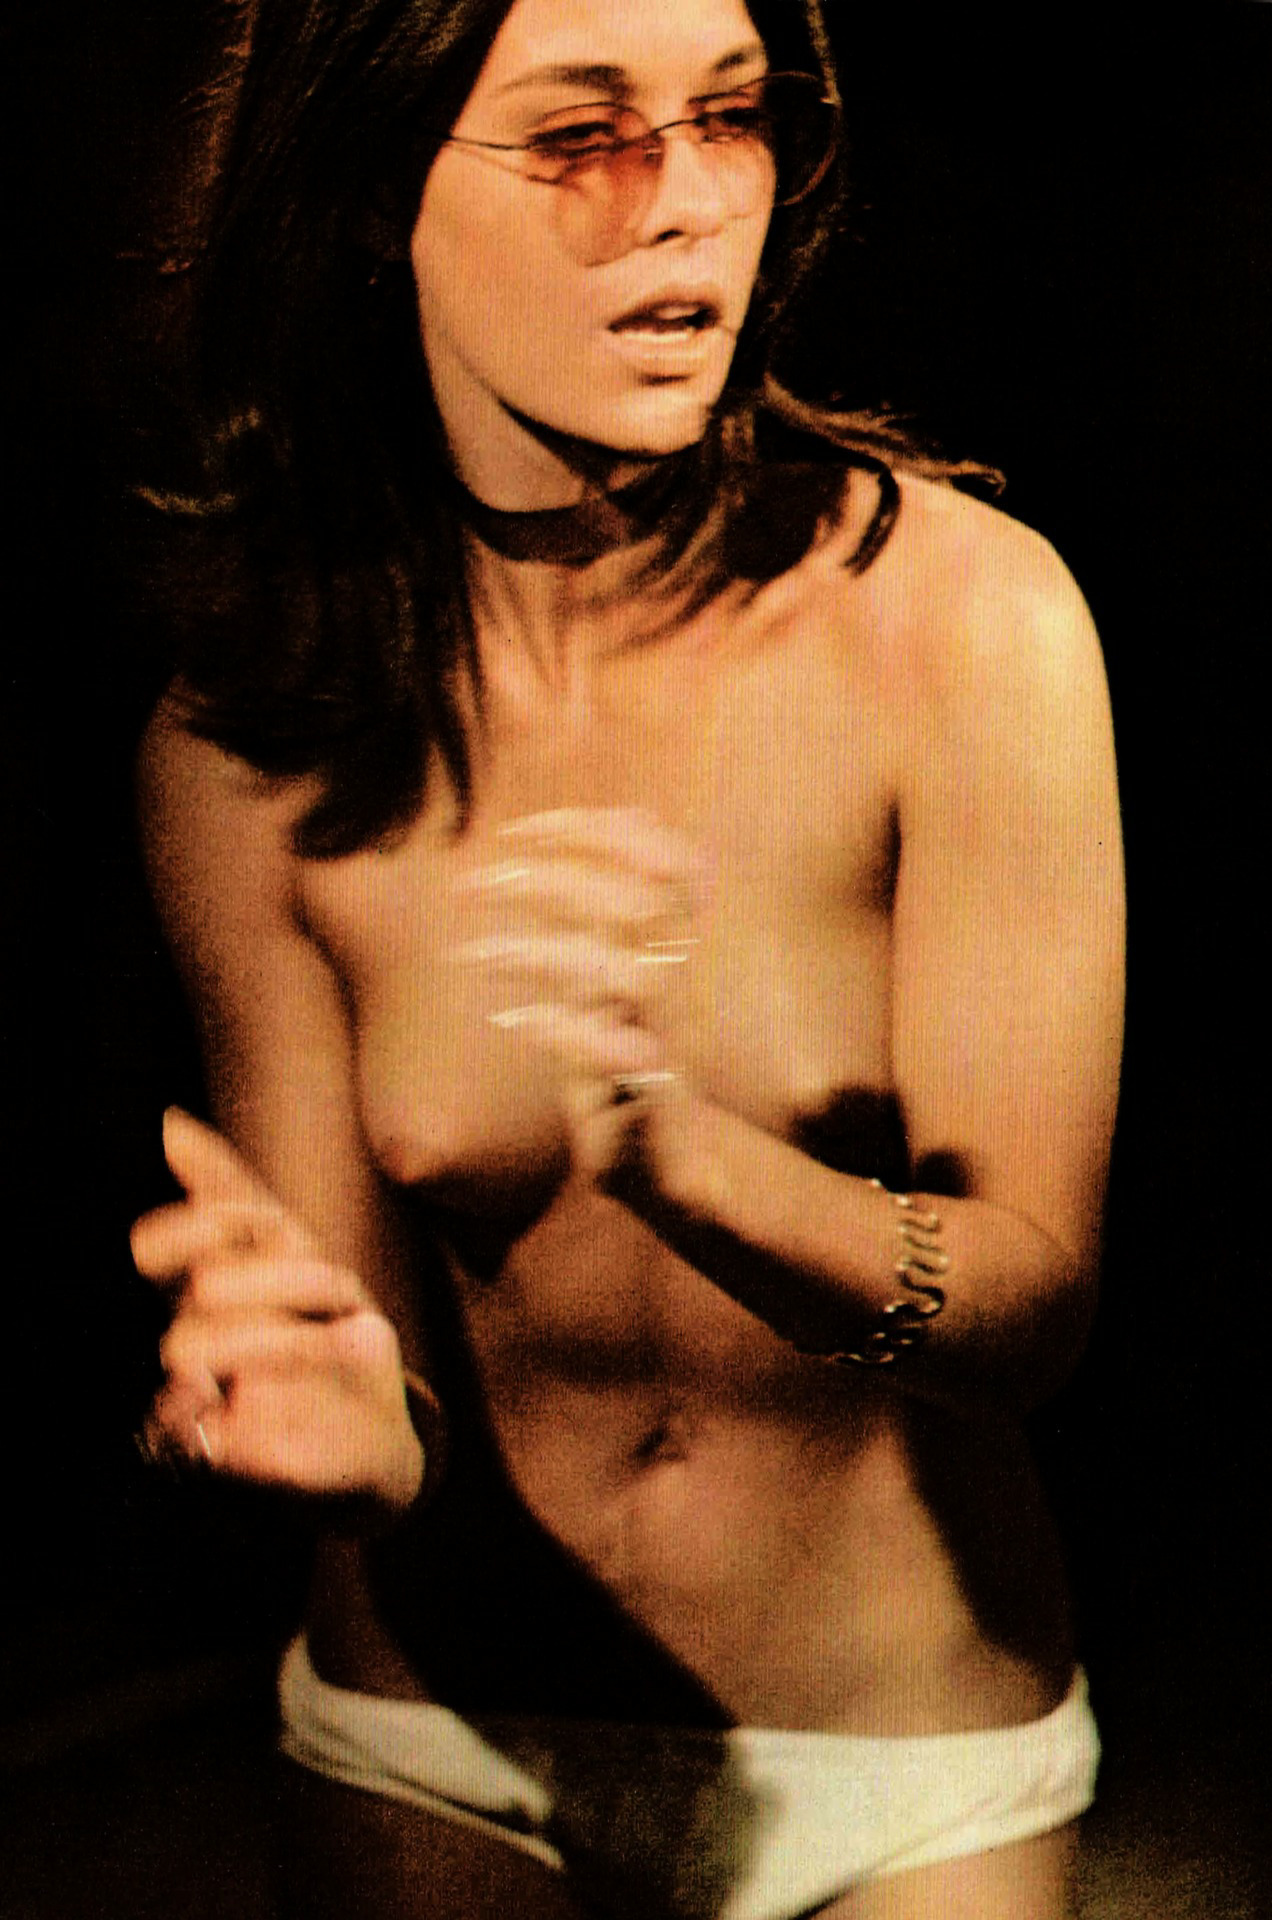 Joanna Cameron topless BS I LOVE you 5.jpg